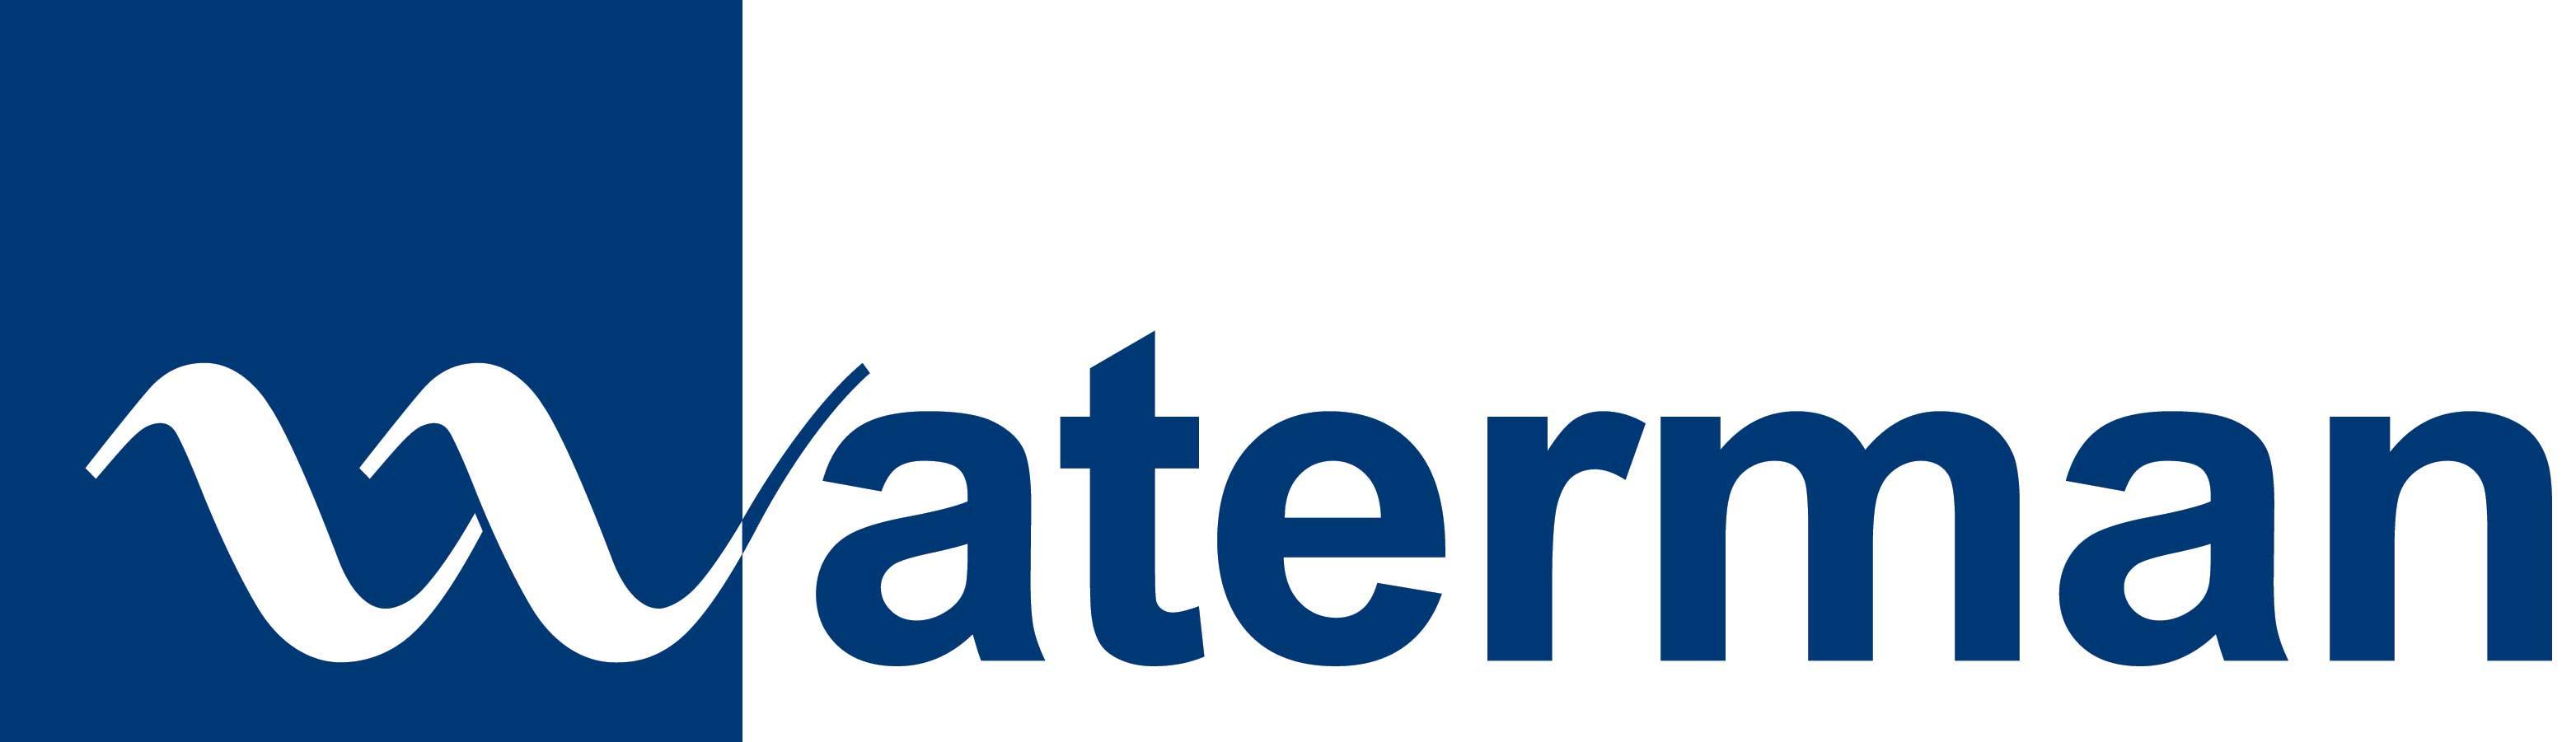 waterman-group-plc-logo